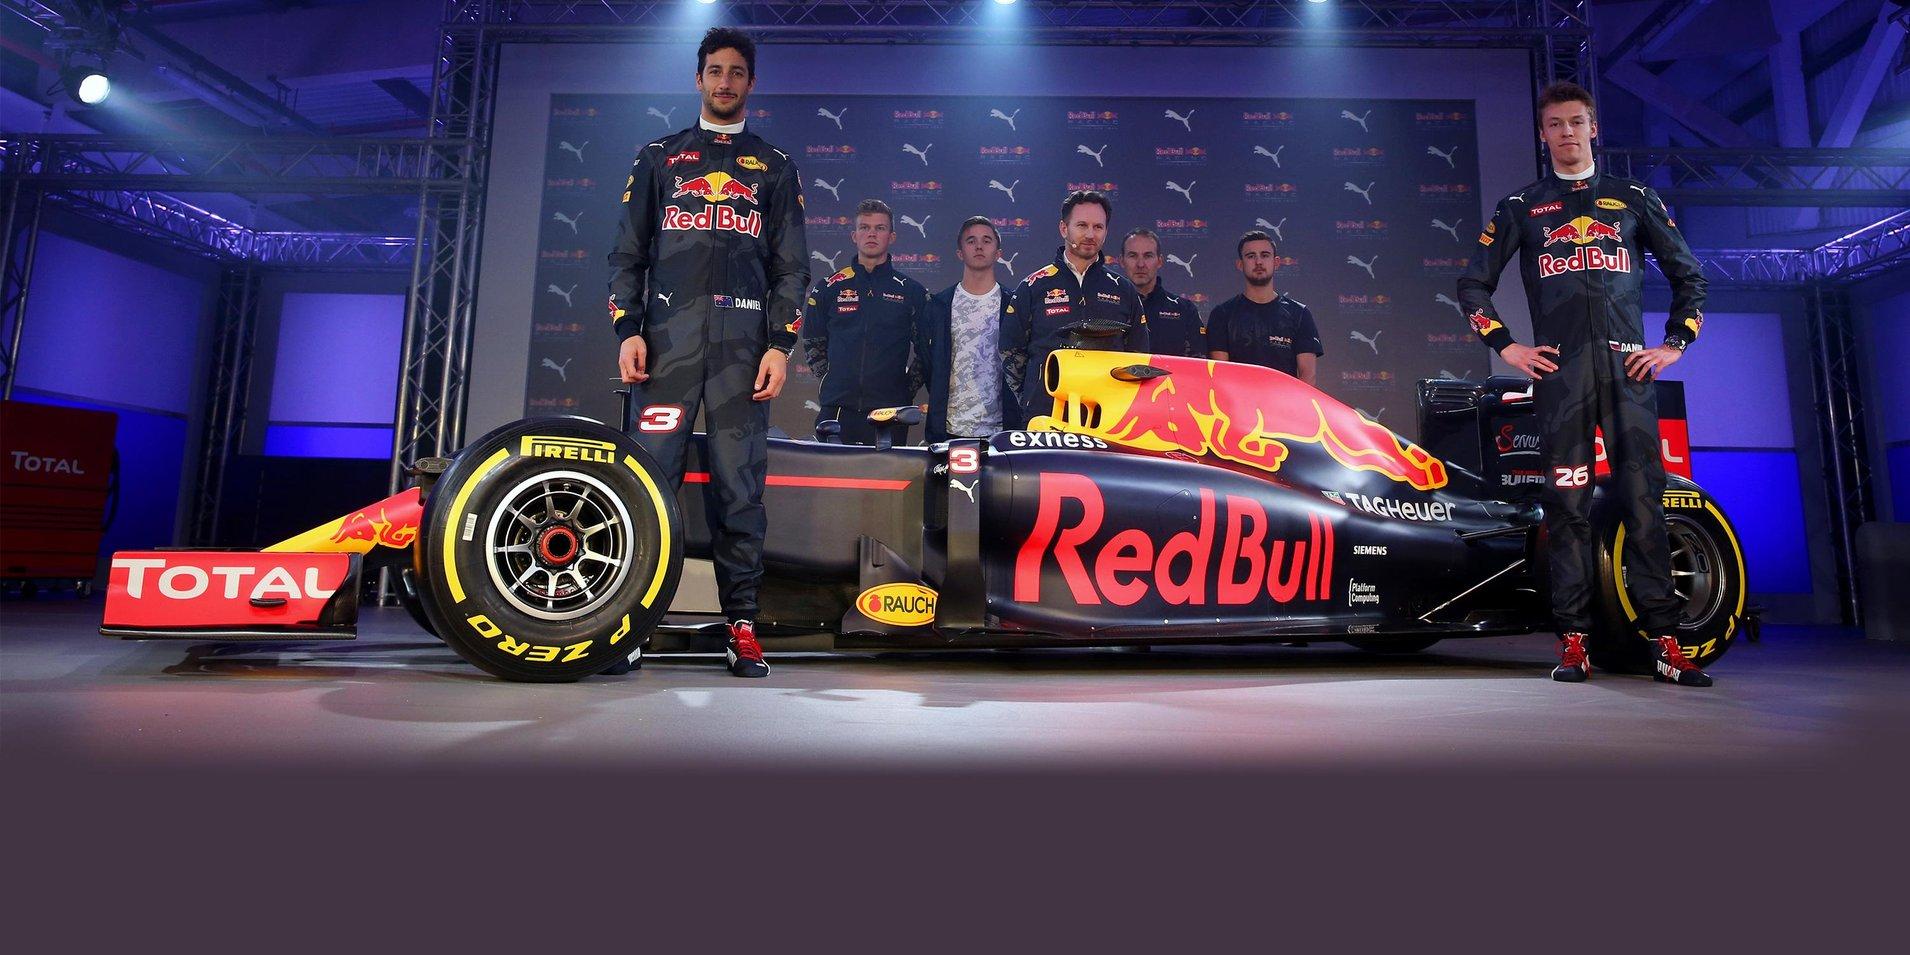 Formule1 De Nieuwe Livery Van Red Bull Is Sweet